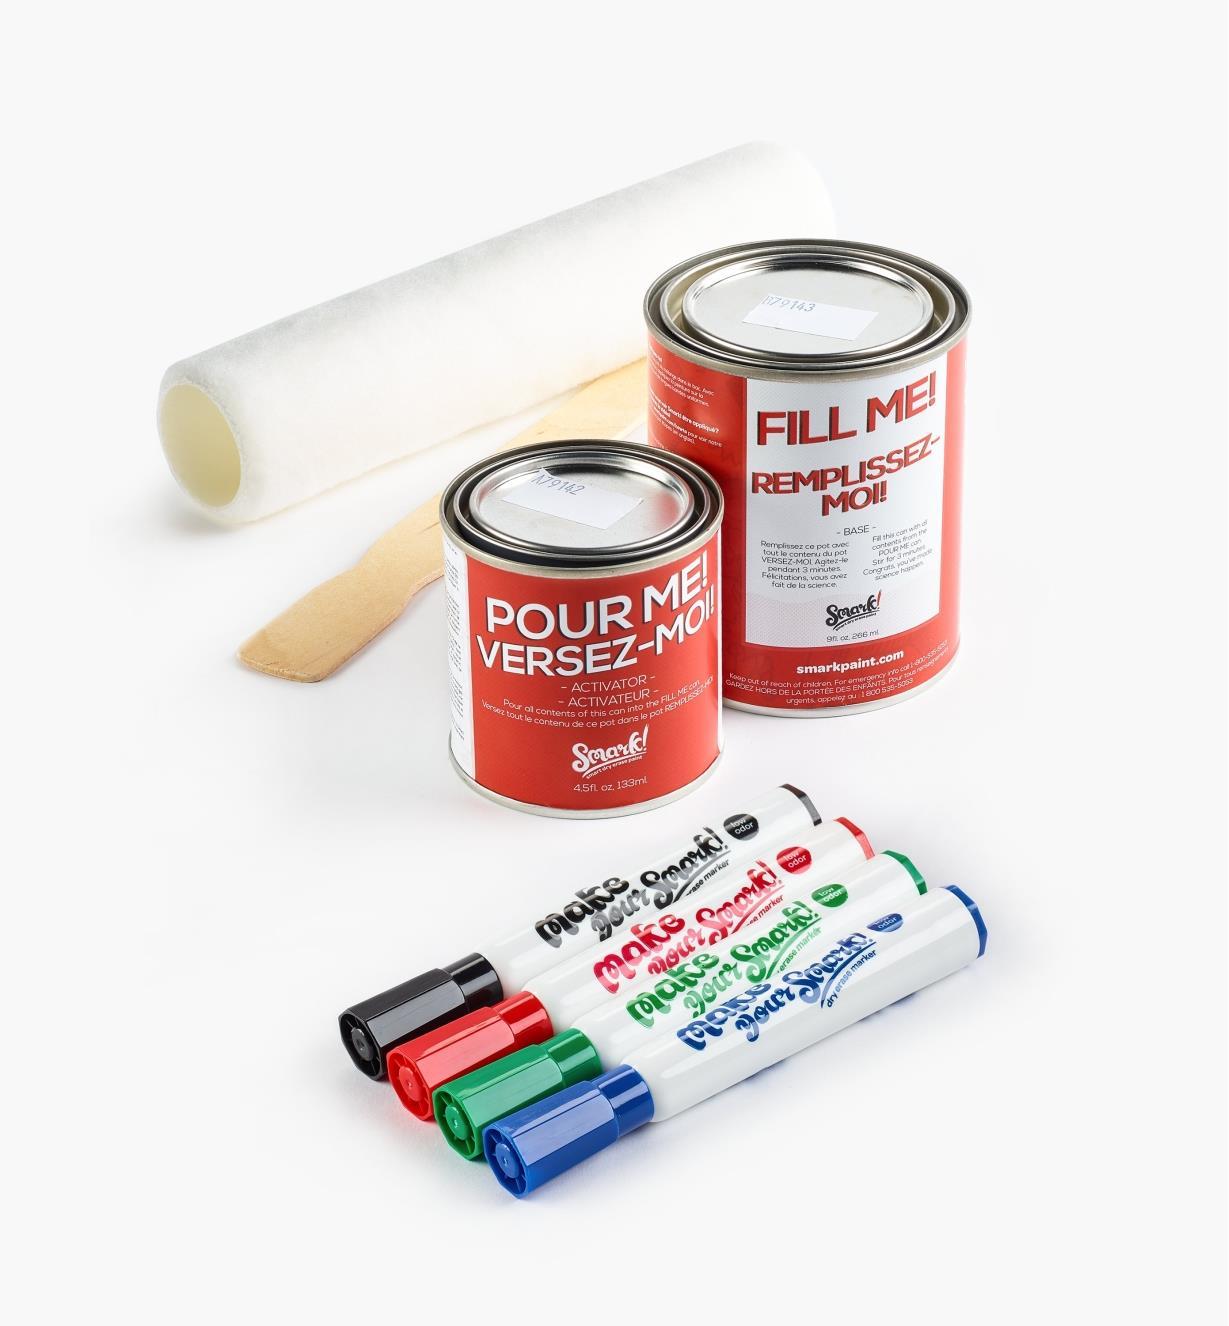 09A0961 - Dry-Erase Surface Kit